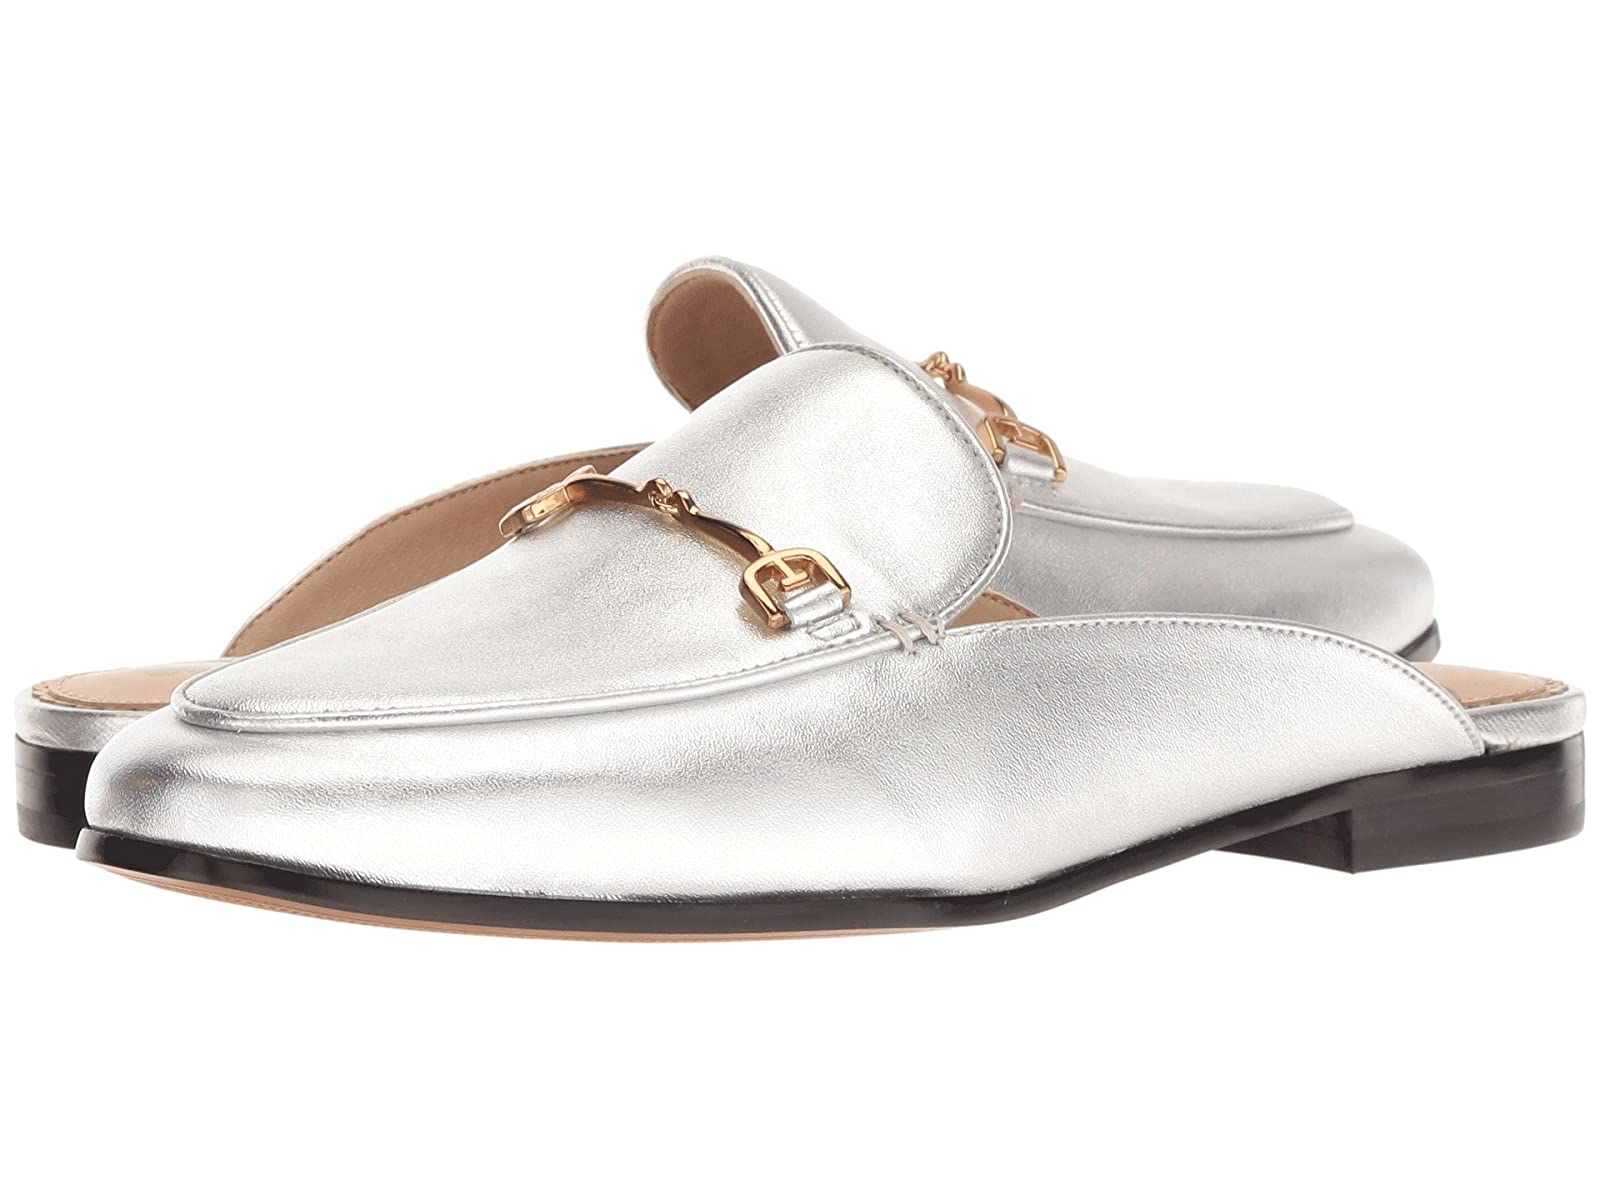 Sam Edelman LinnieCheap and distinctive eye-catching shoes